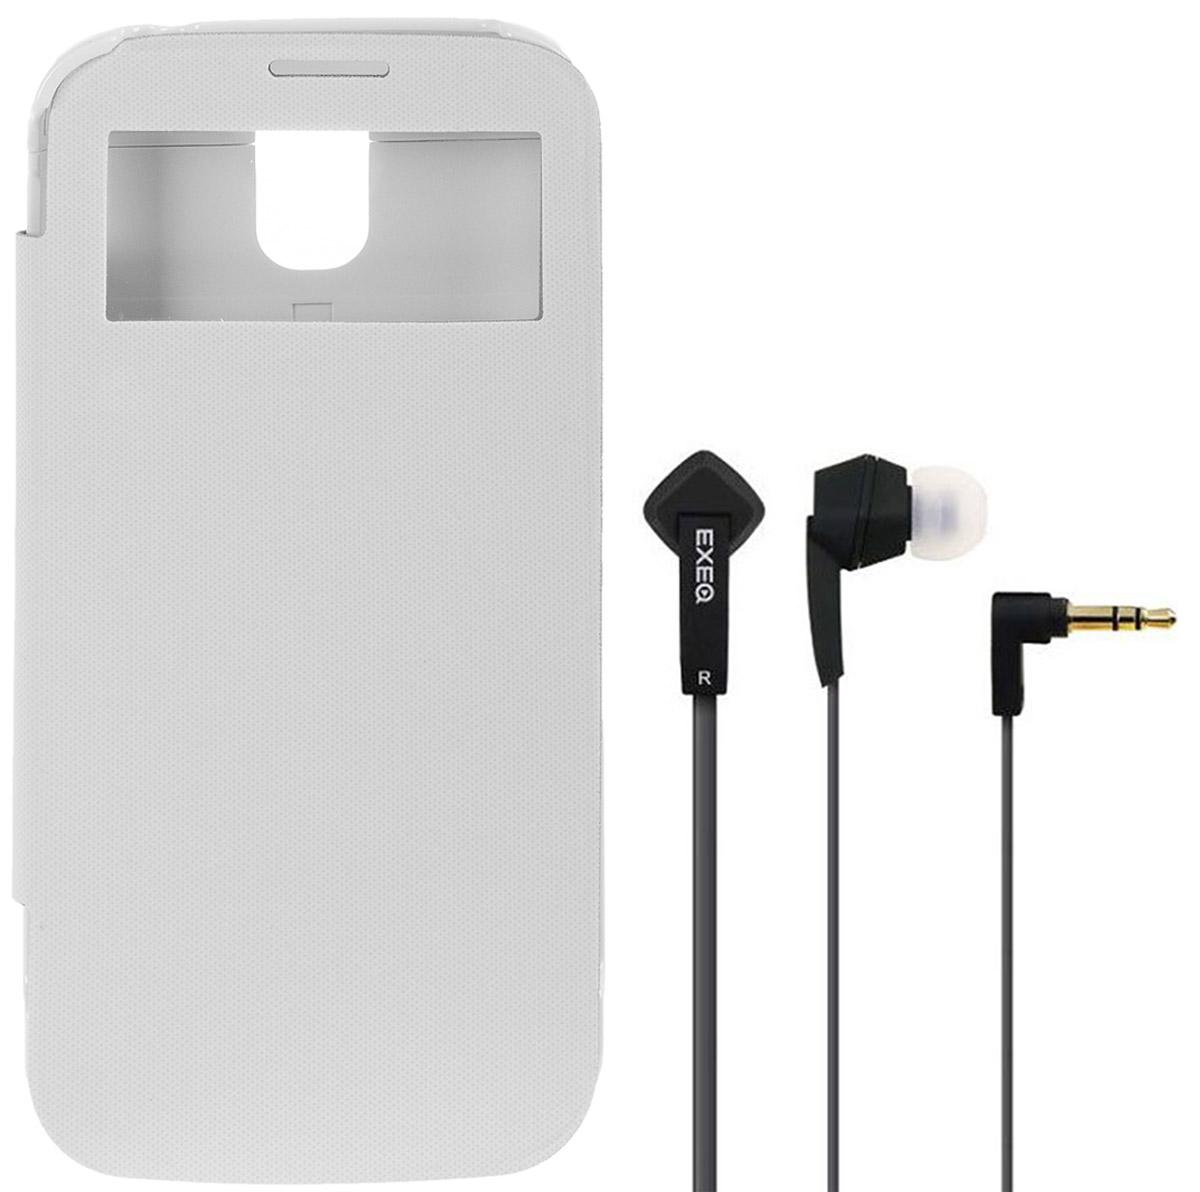 EXEQ HelpinG-SF07 чехол-аккумулятор для Samsung Galaxy S4, White (2600 мАч, Smart cover, флип-кейс)